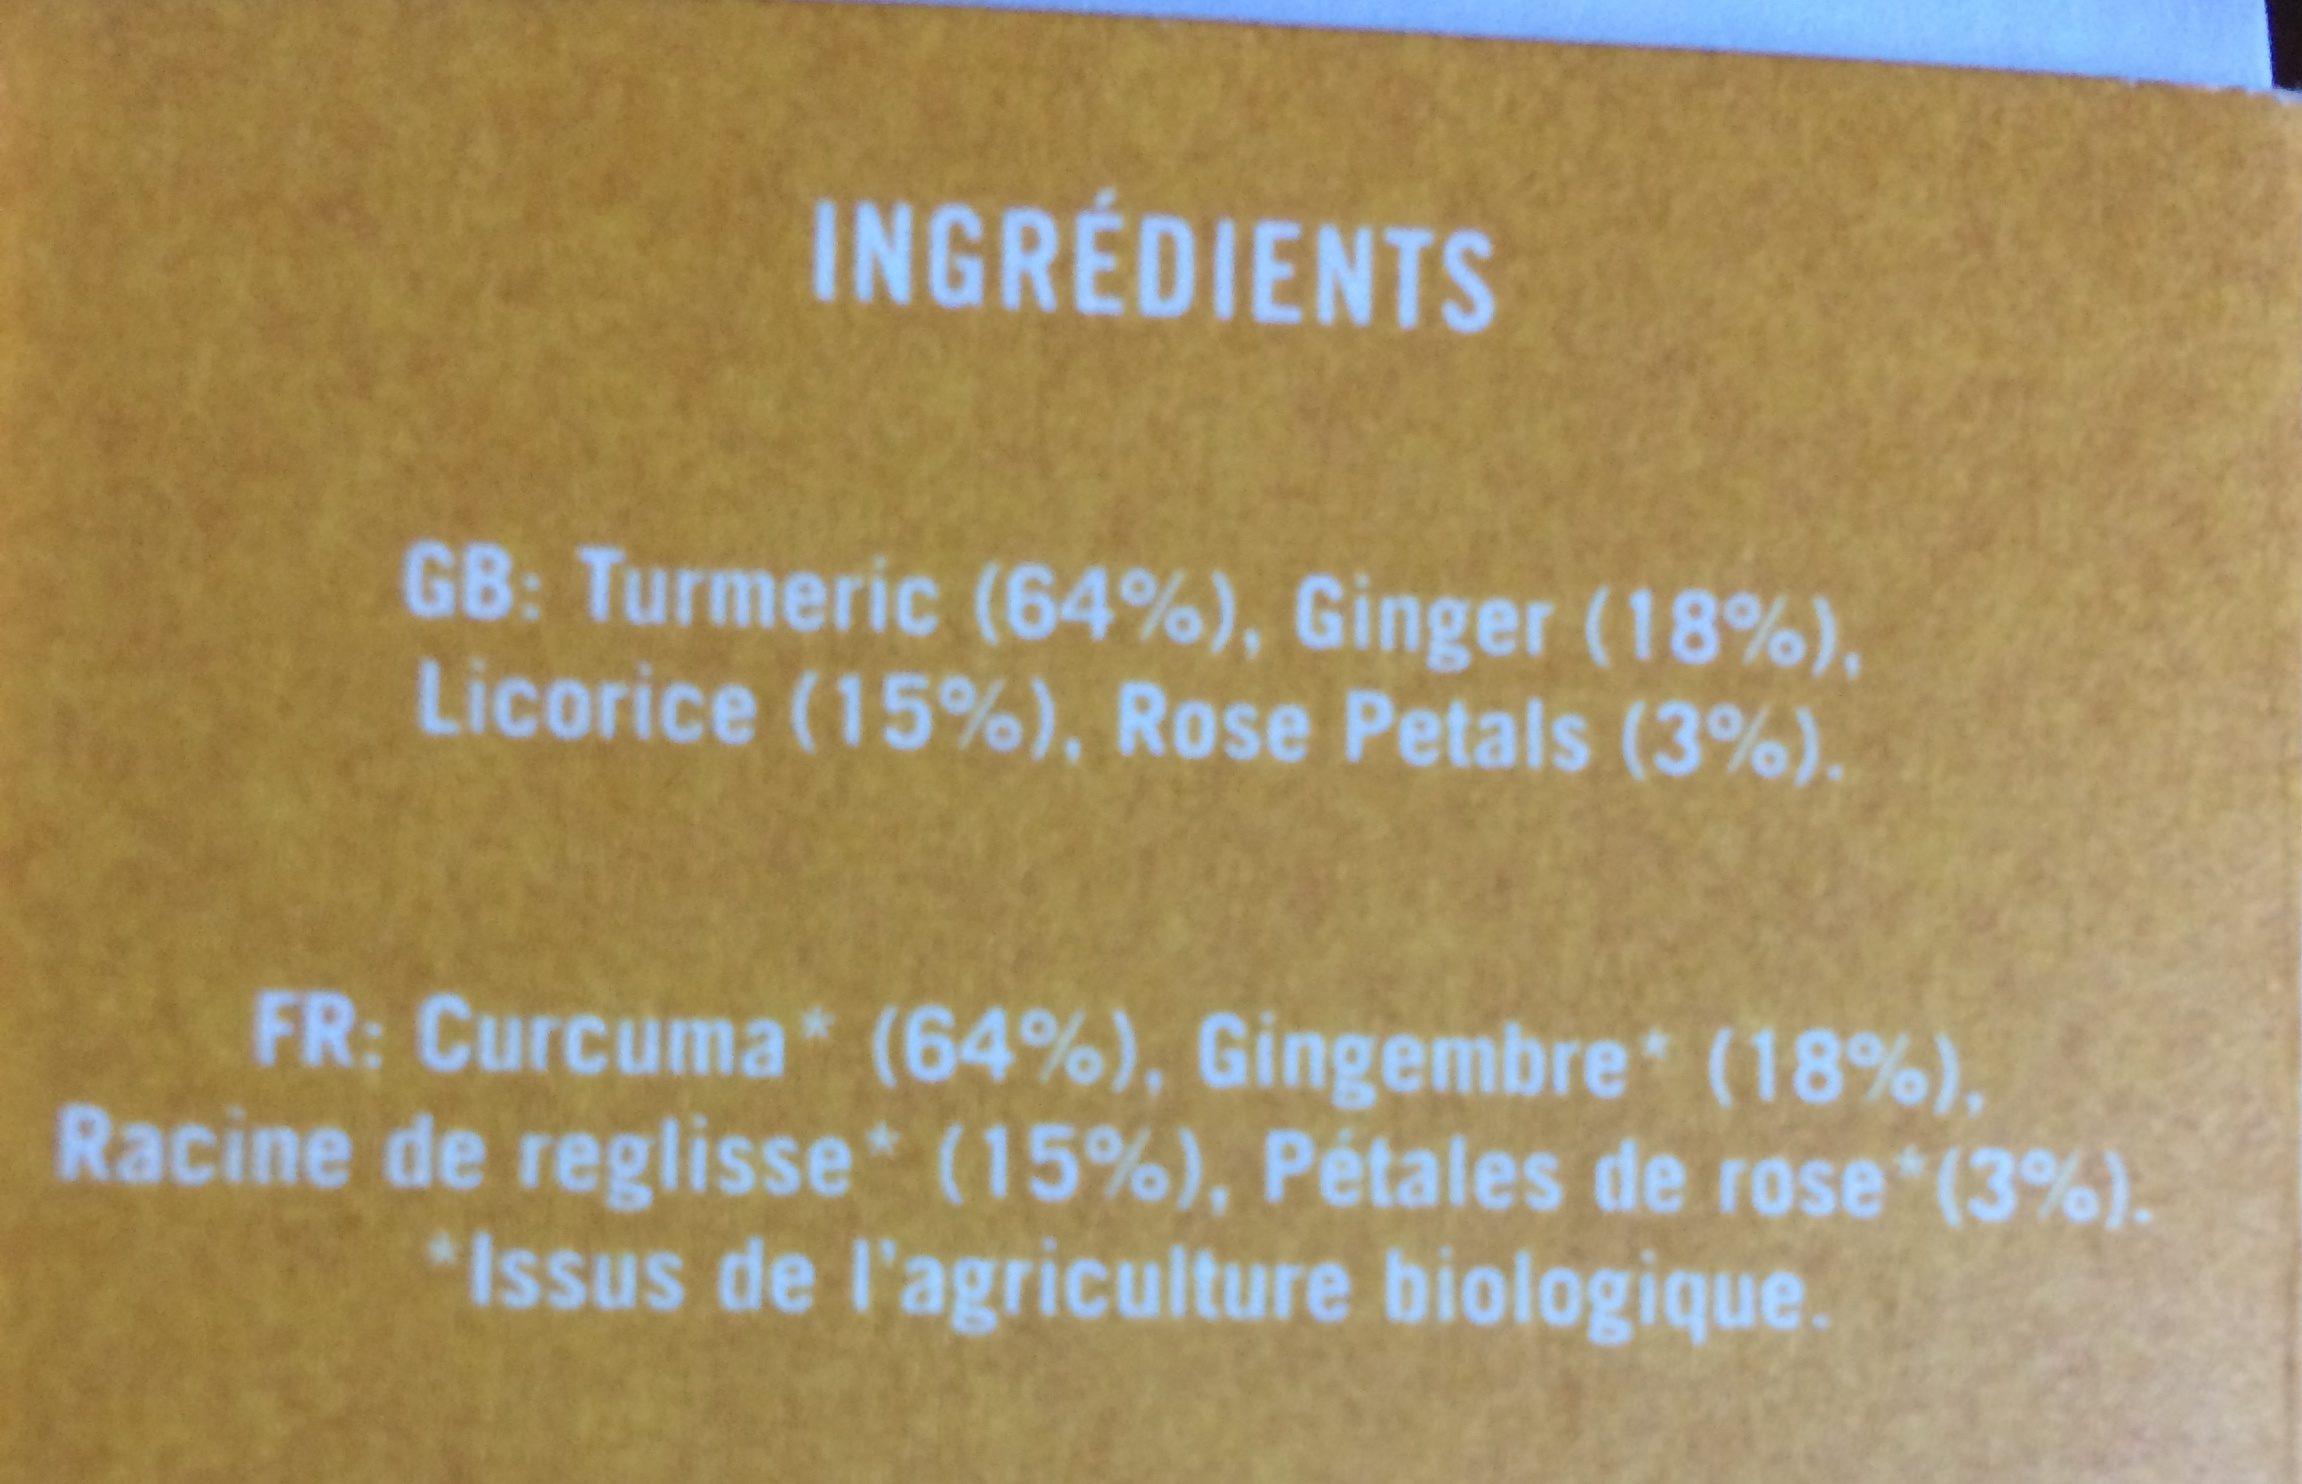 Golden Tumeric - Ingrédients